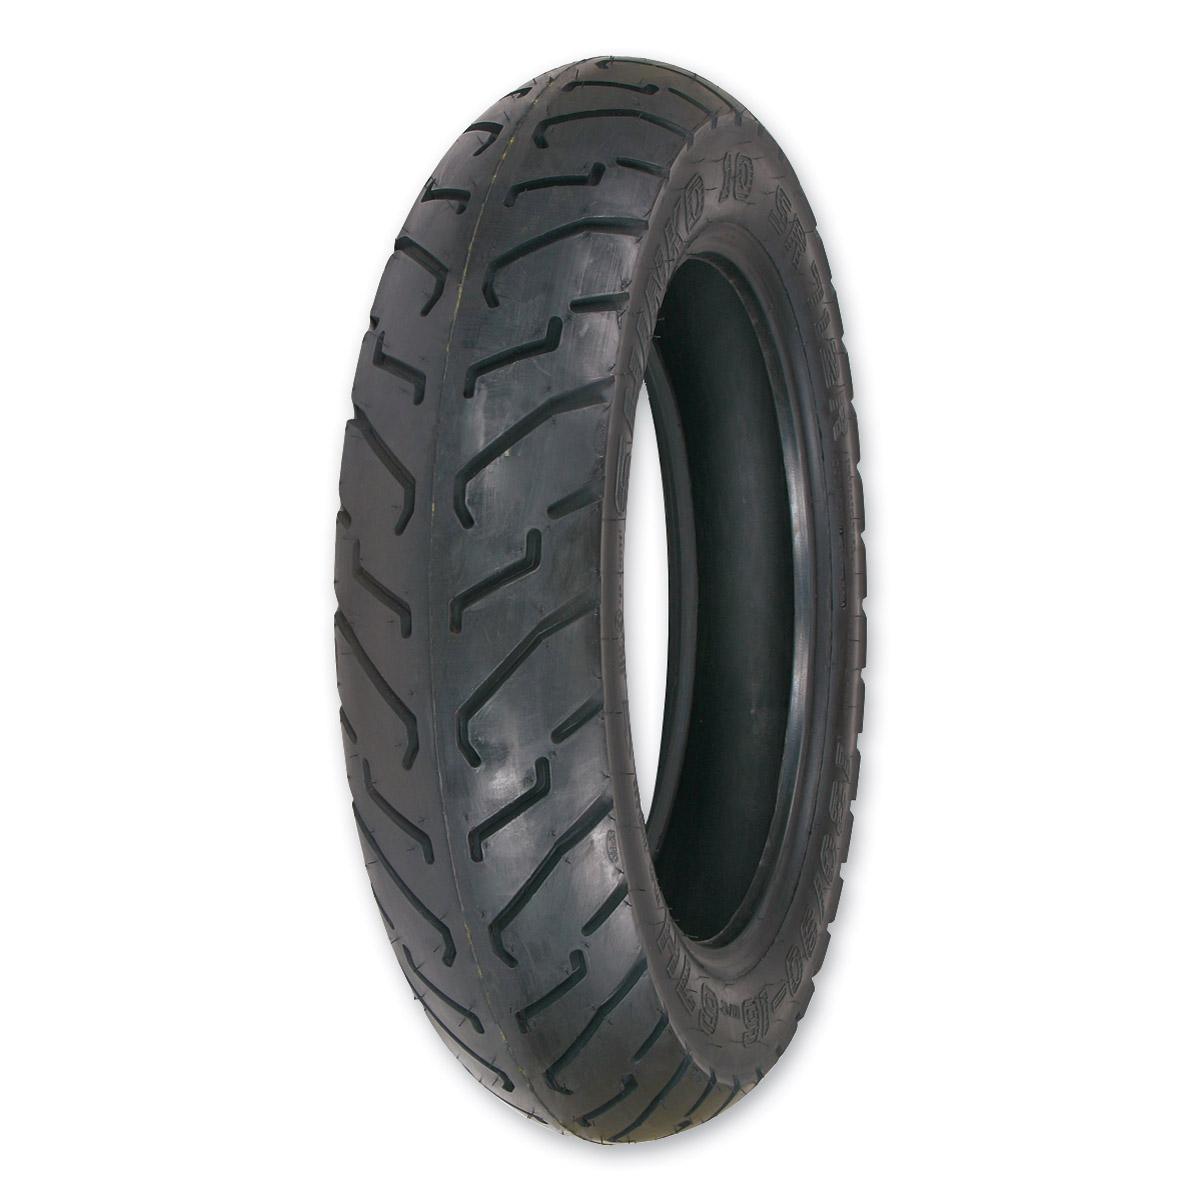 Shinko 712 130/90-16 Rear Tire